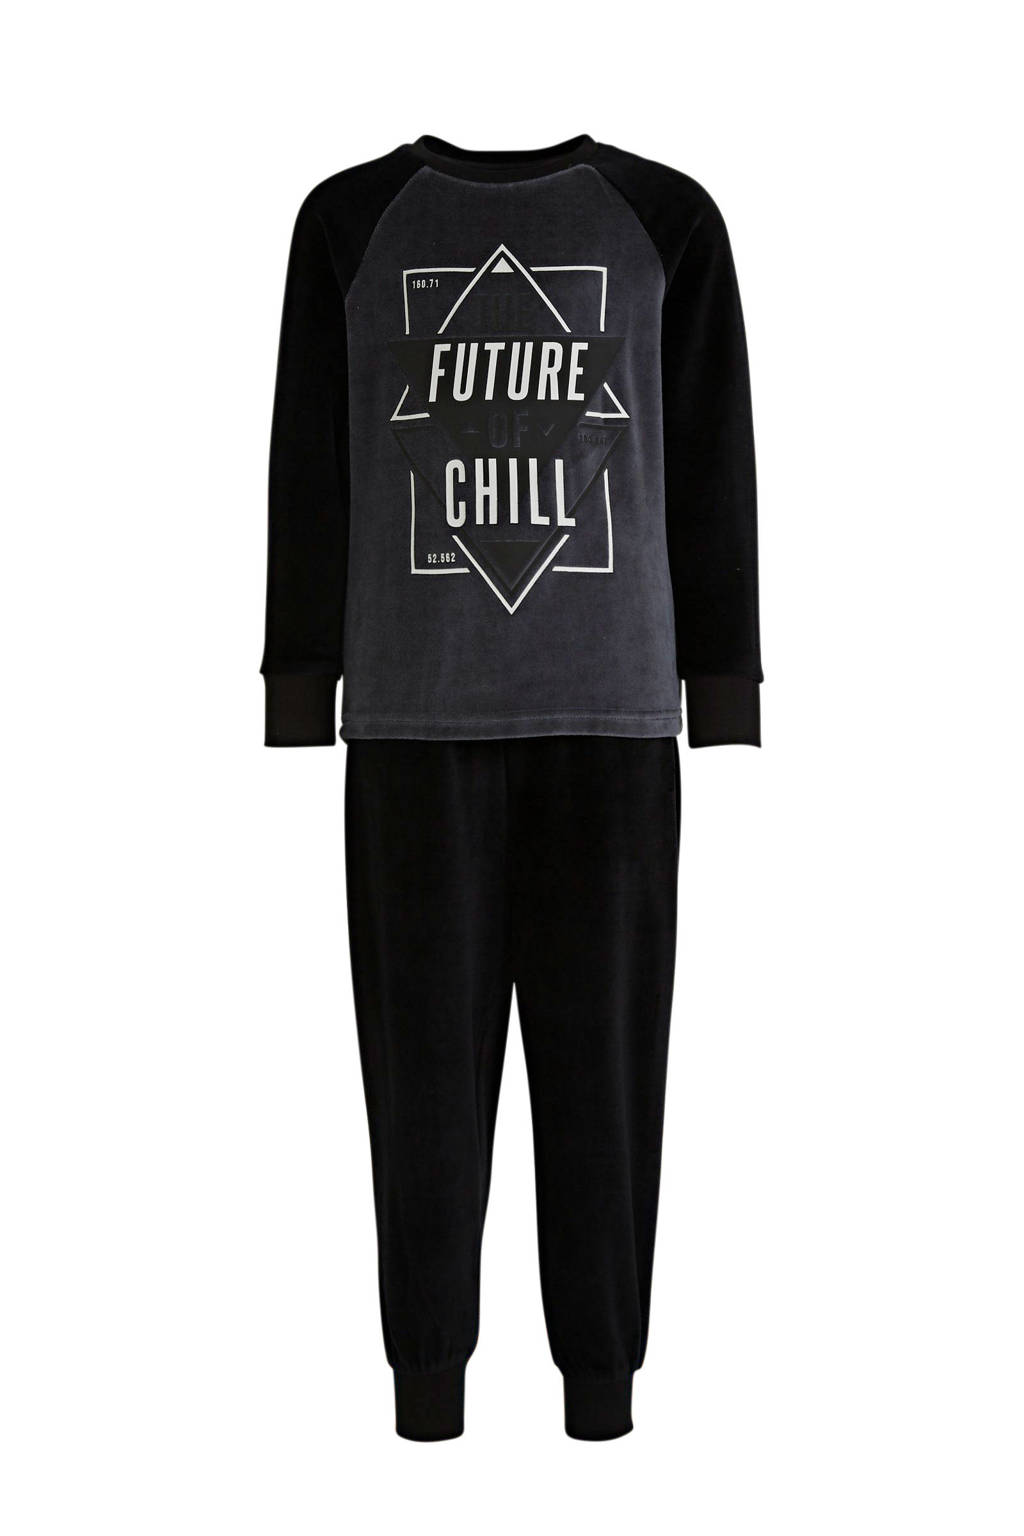 C&A Here & There   pyjama tekstopdruk zwart, Zwart